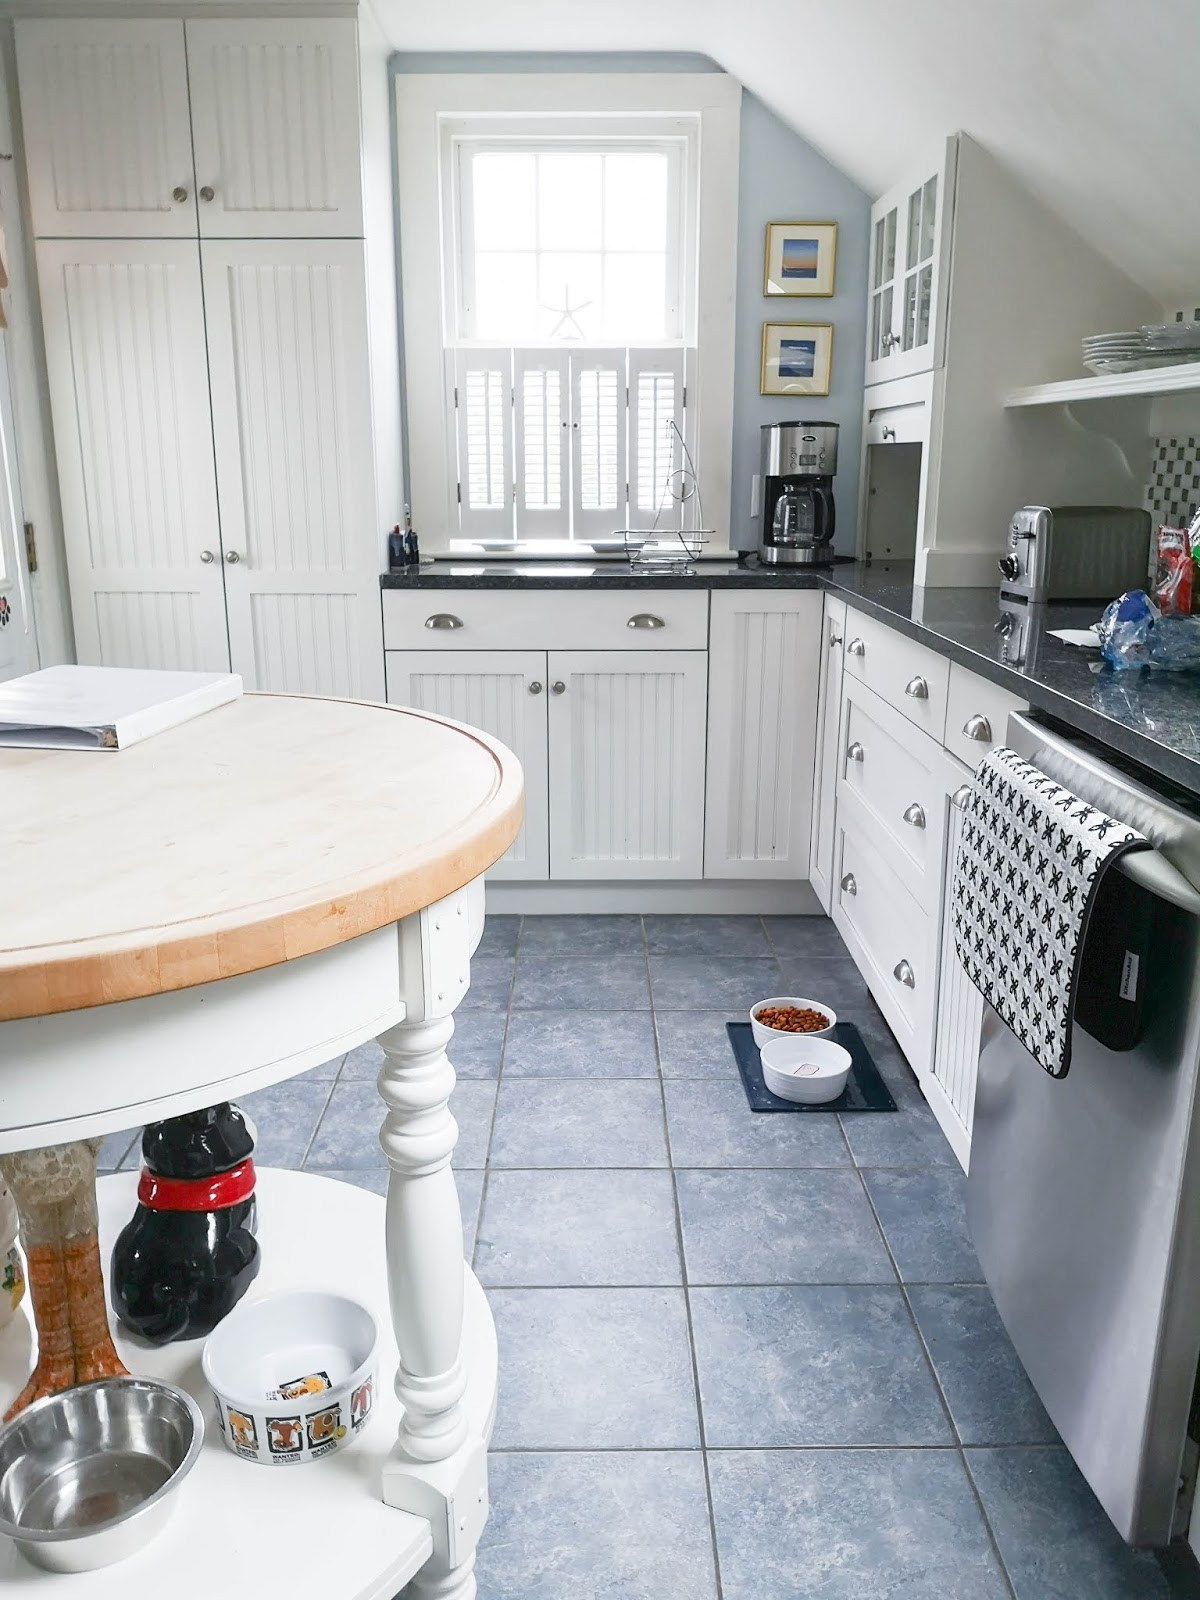 Our Dog Friendly Cape Cod Airbnb Rental